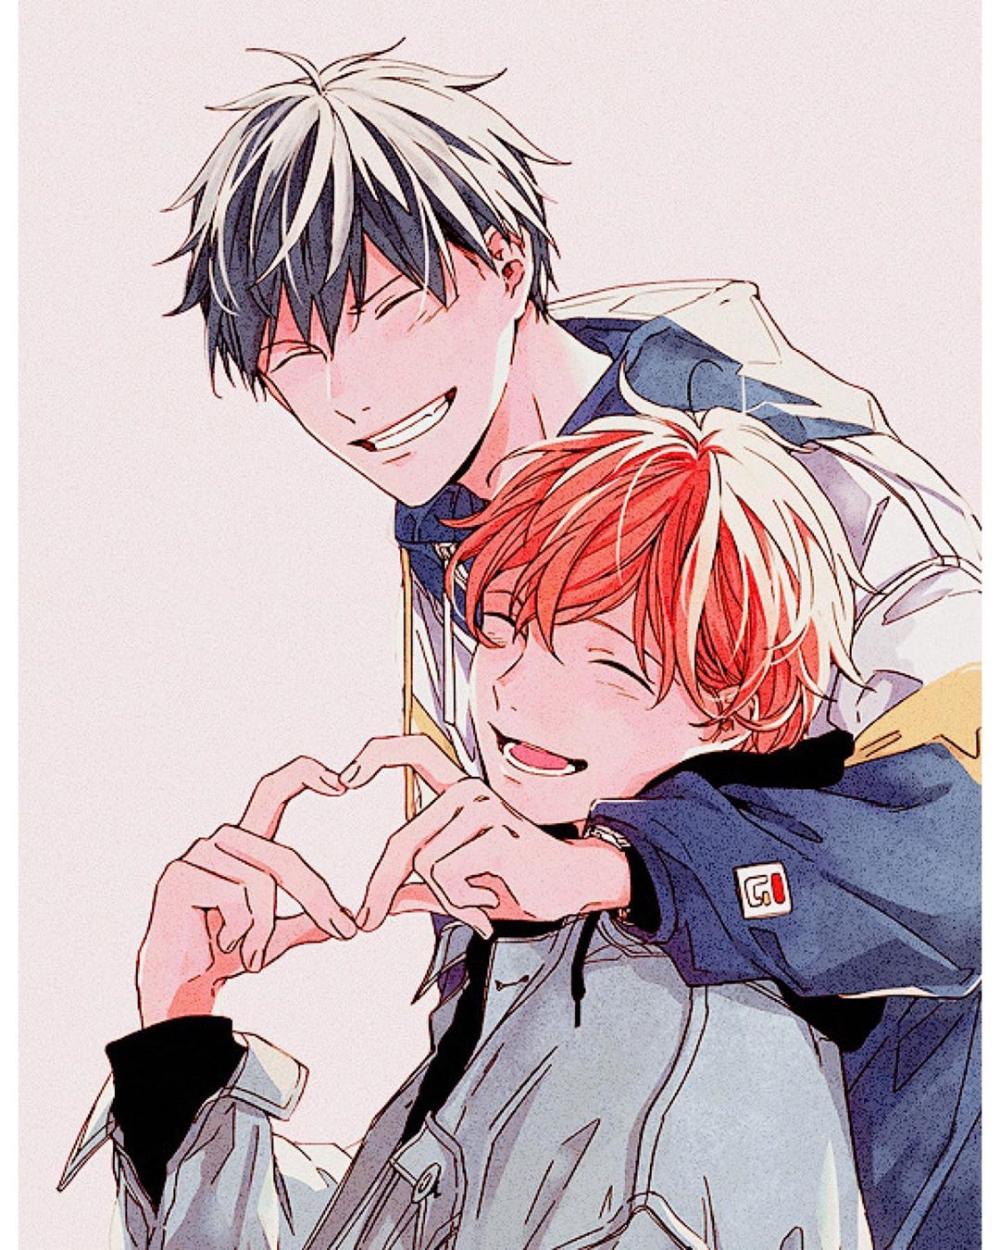 Ritsuka X Satou Pesquisa Google Anime Fan Art Personajes De Anime Parejas De Anime Manga